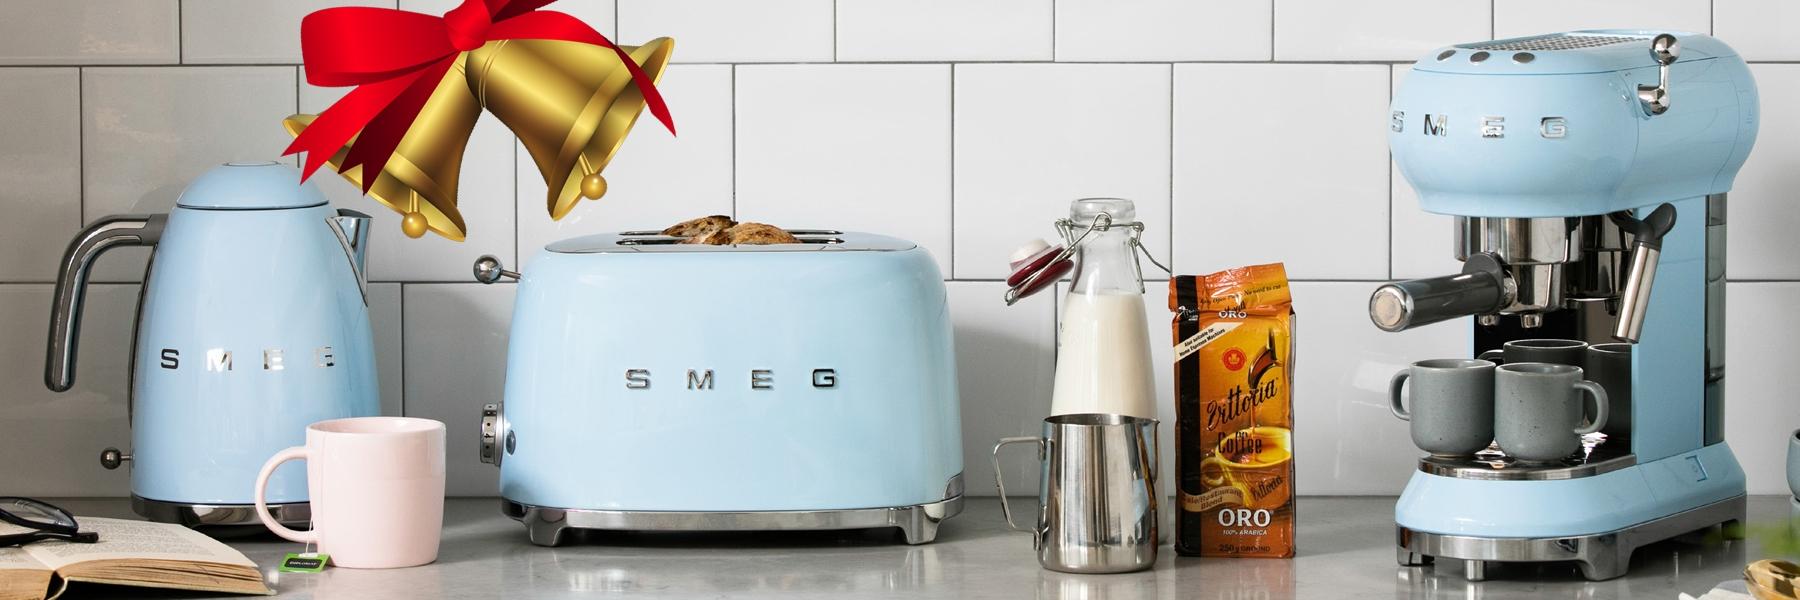 smeg-foodservice-xmas-promo